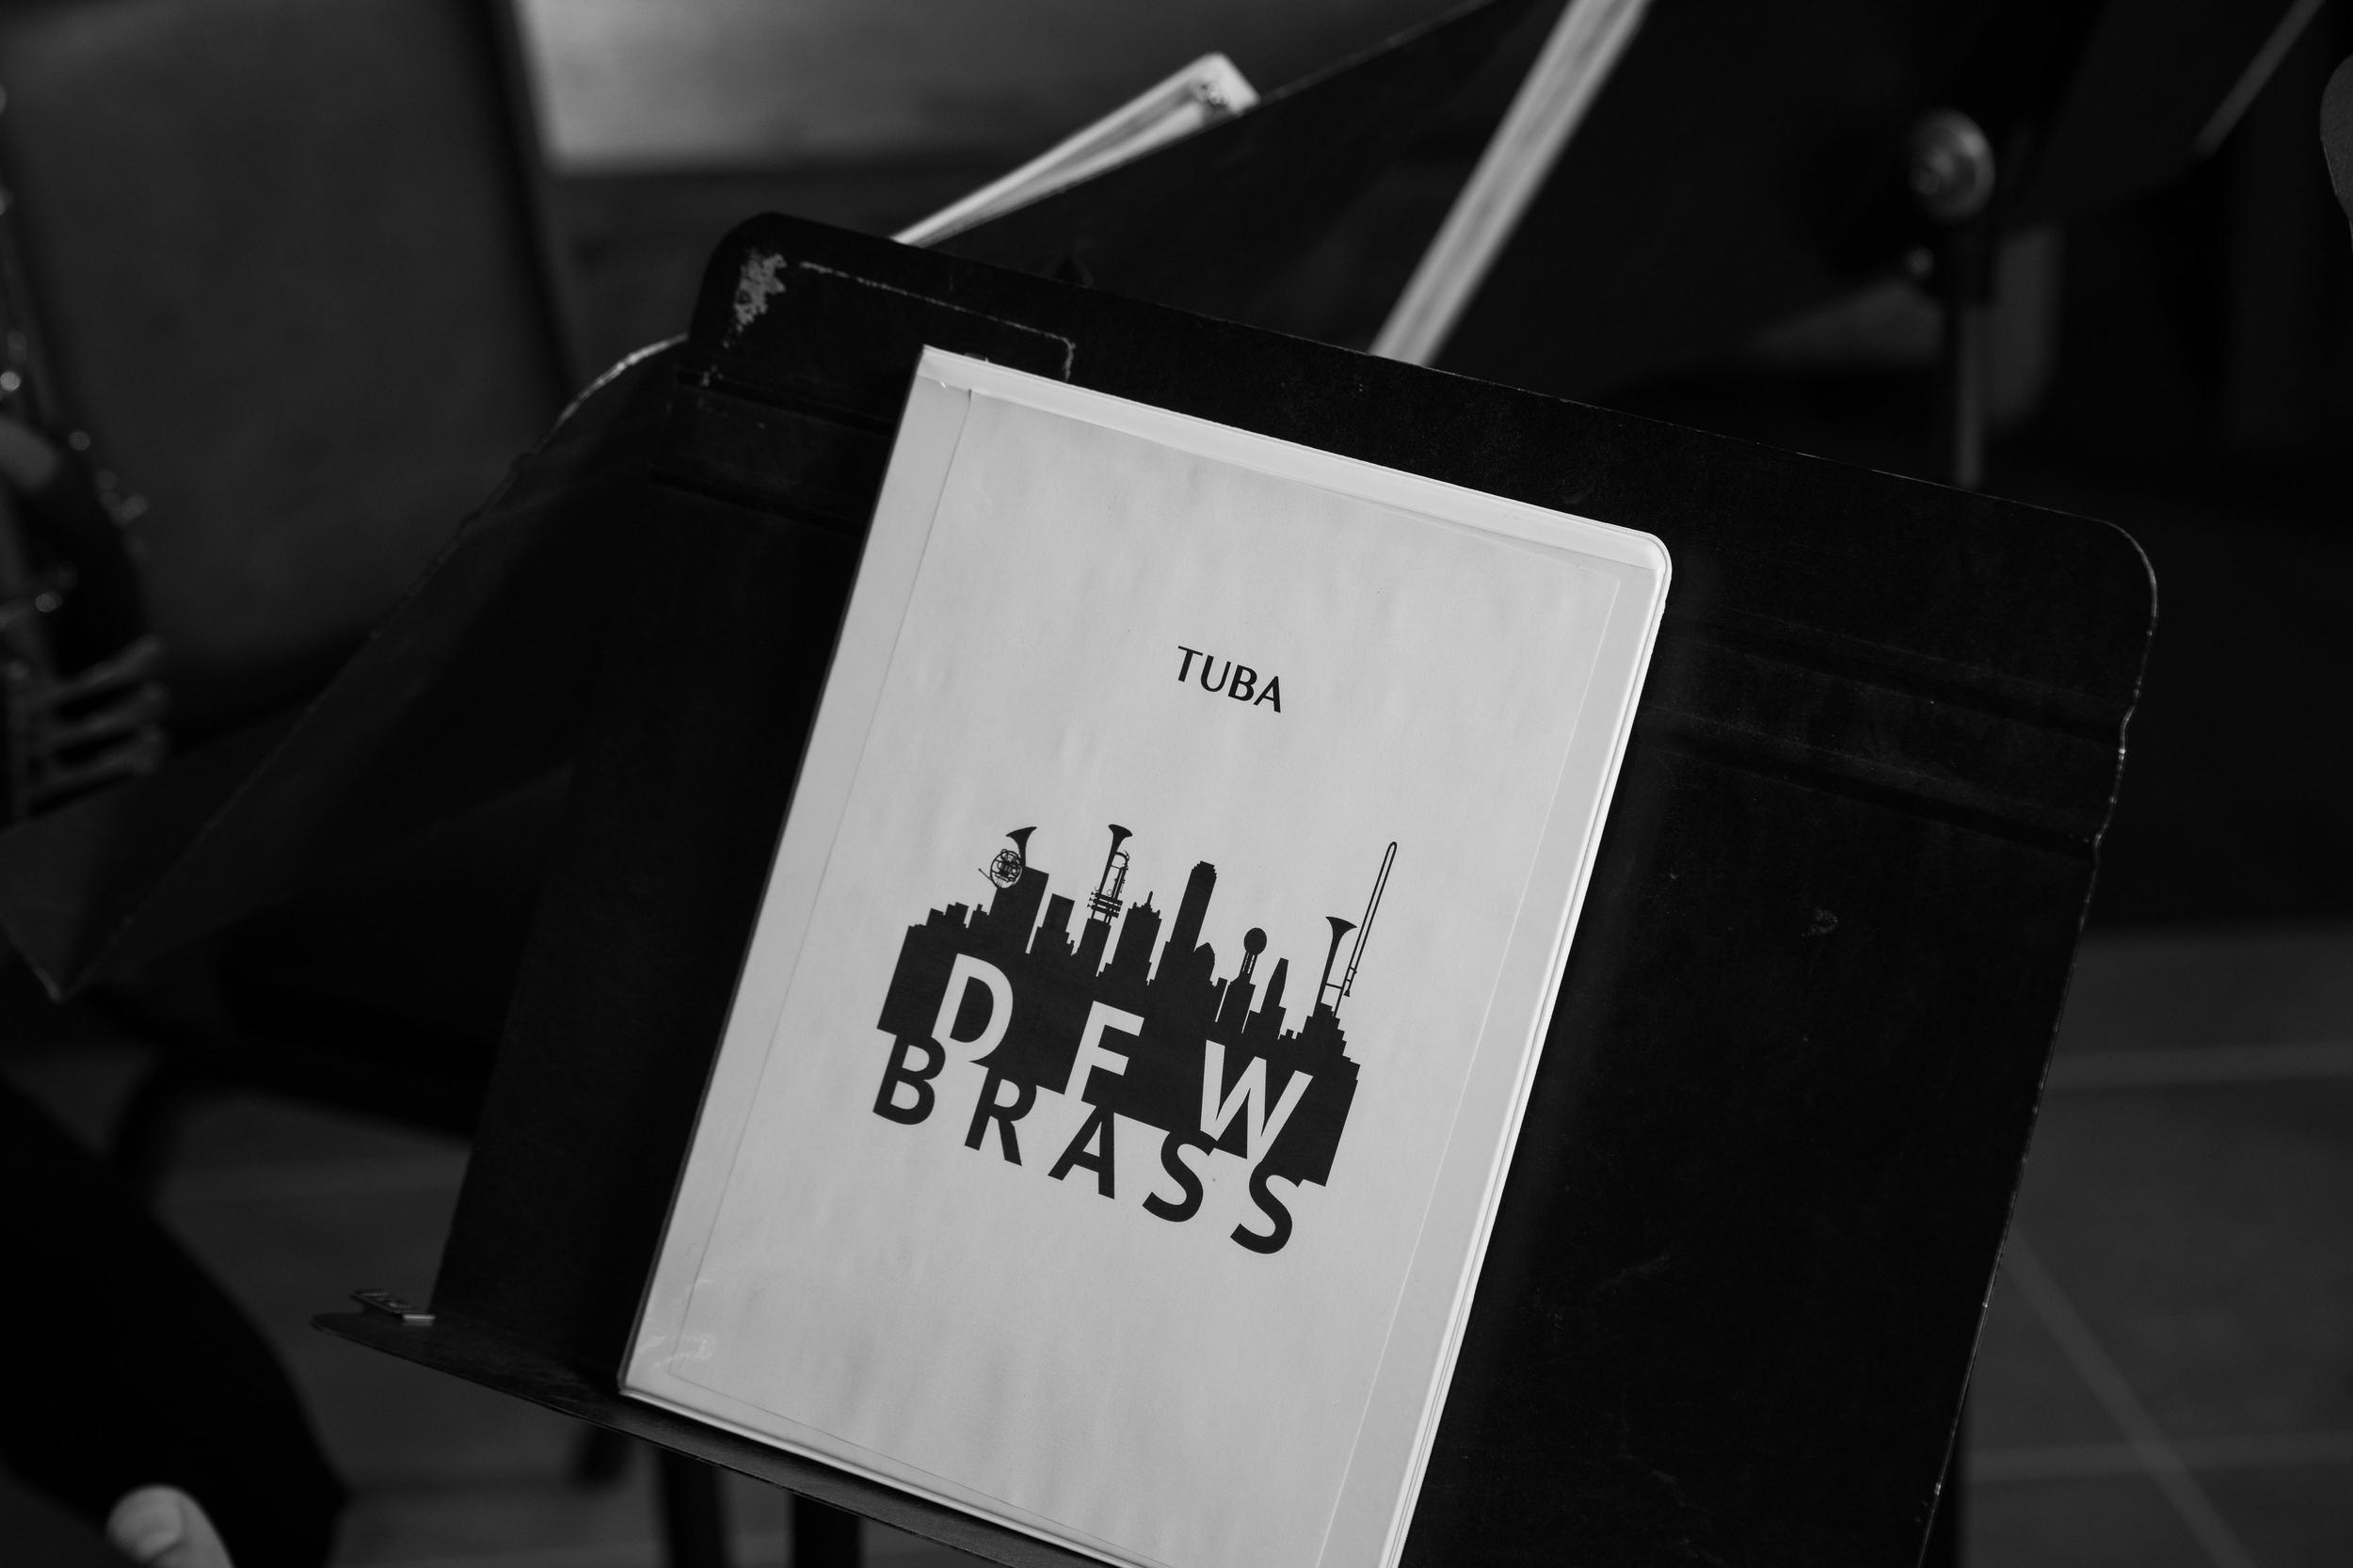 folder on stand with DFW Brass logo.jpg